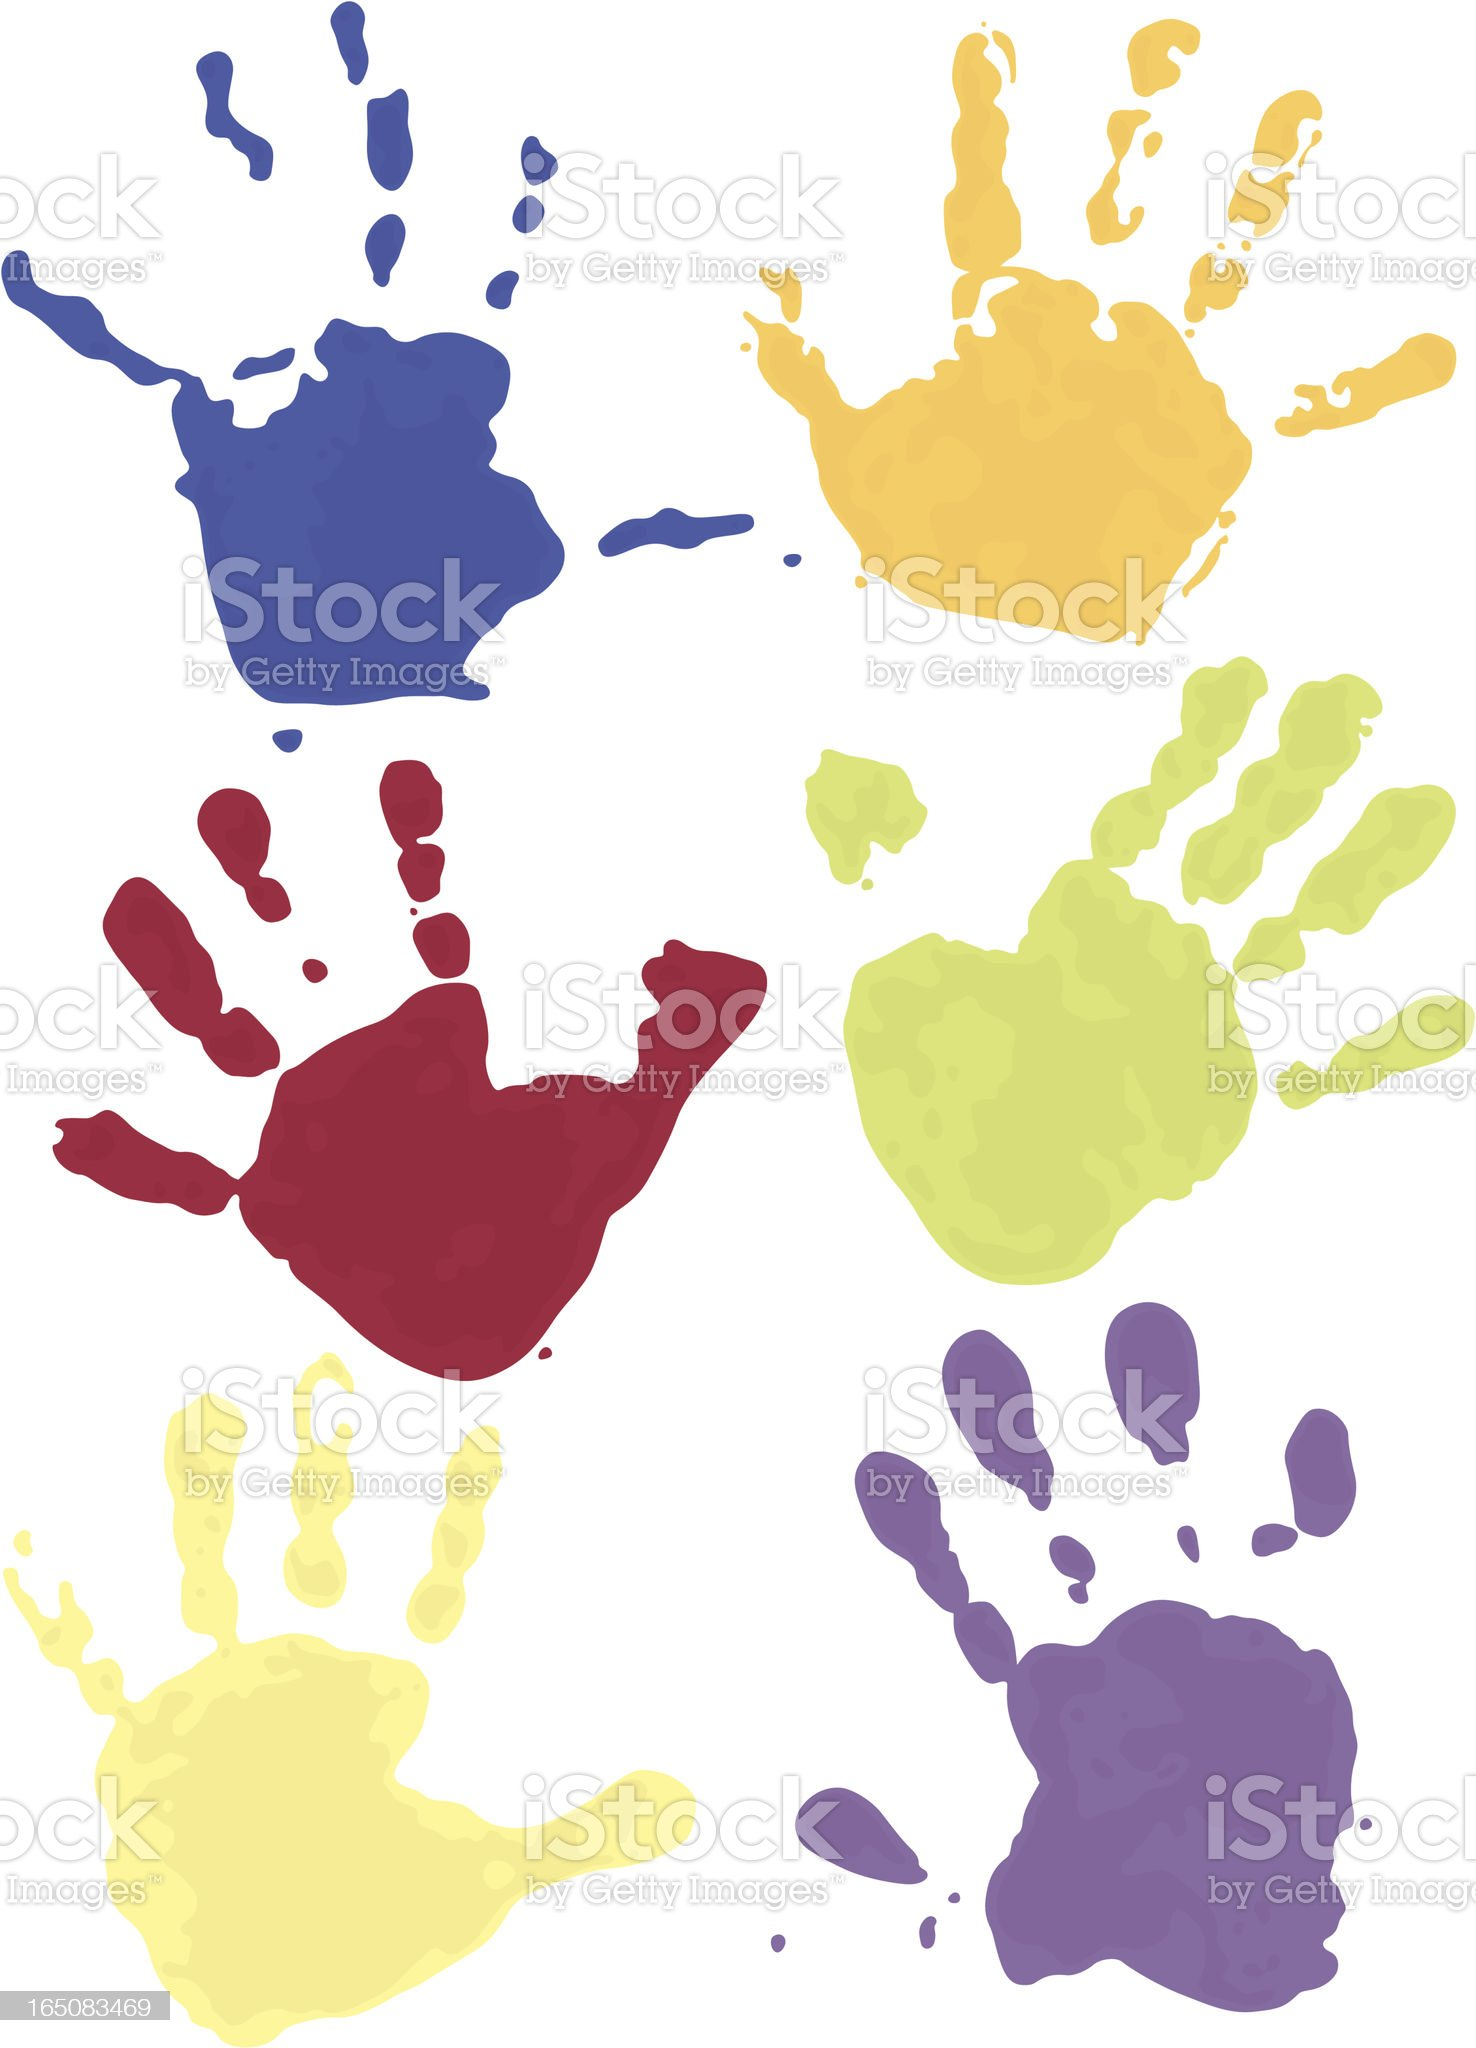 Hands Down royalty-free stock vector art